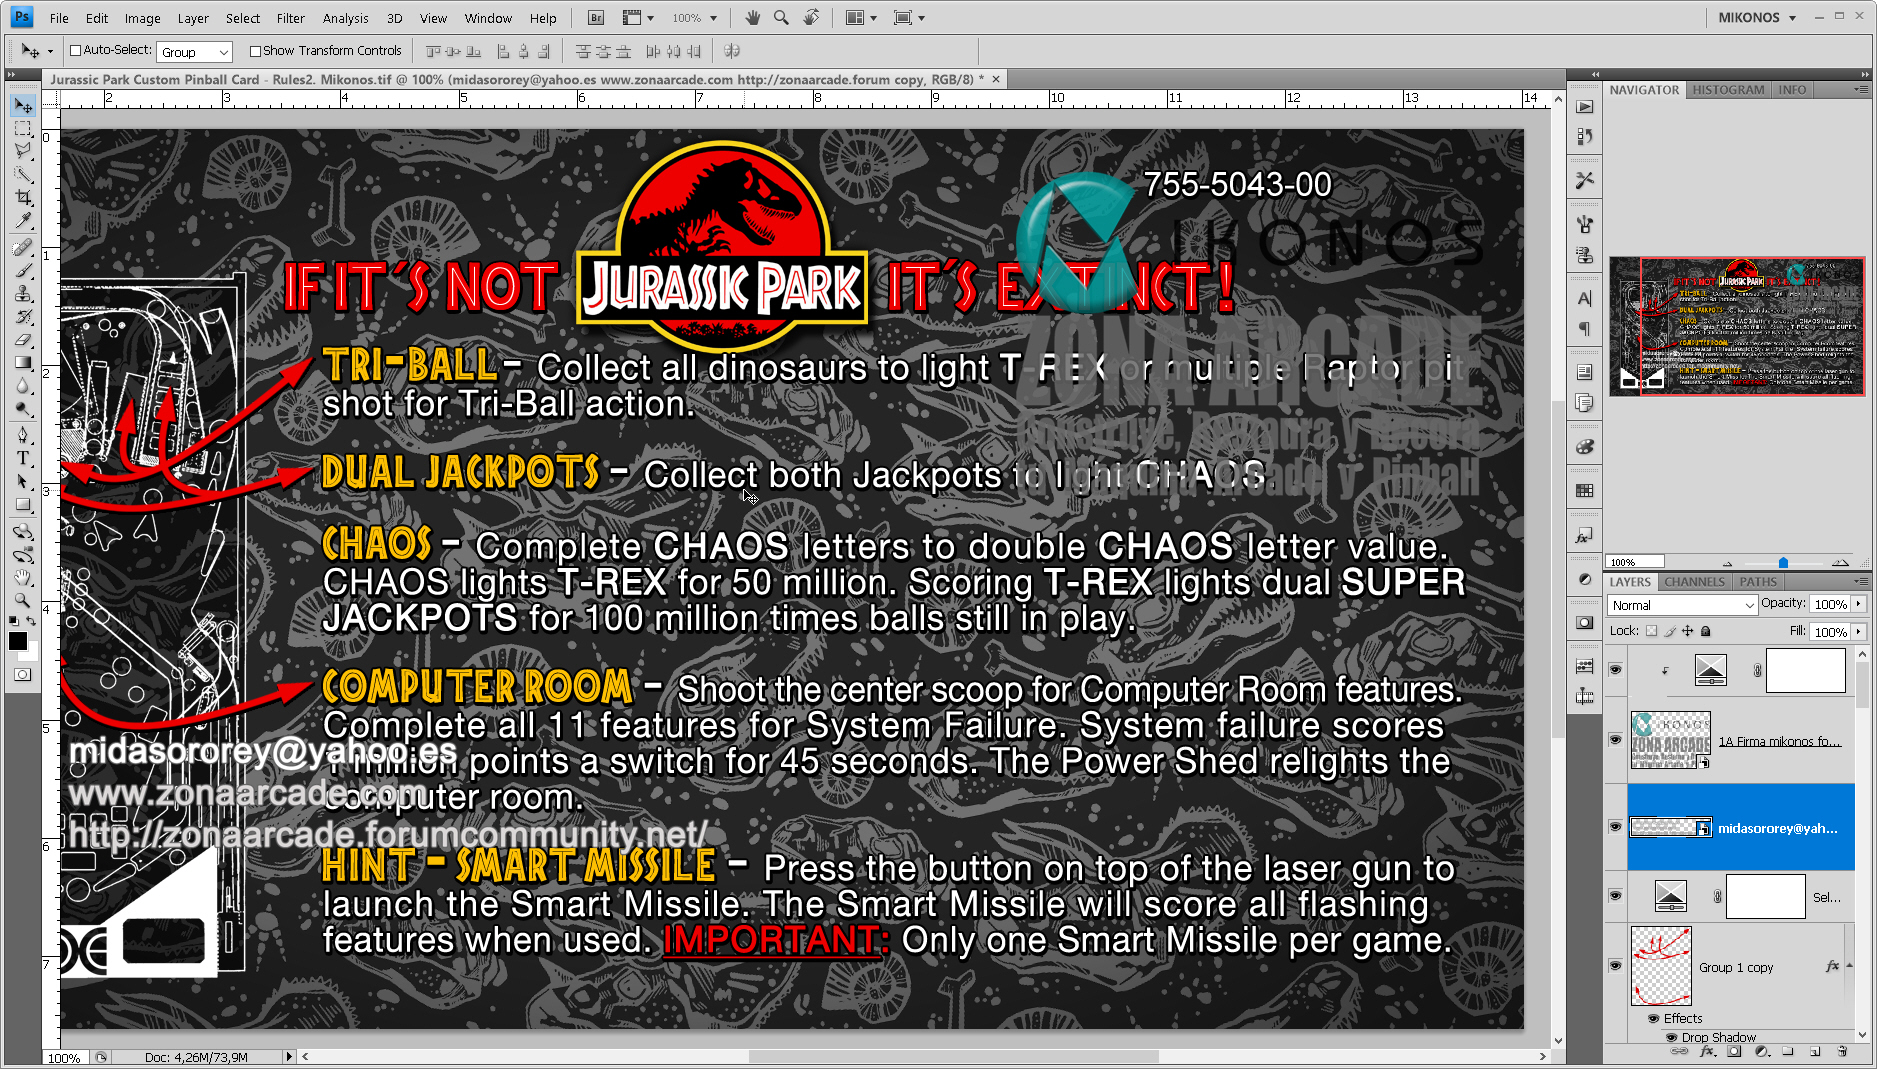 Jurassic%20Park%20Custom%20Pinball%20Card%20-%20Rules.%20Mikonos4.jpg